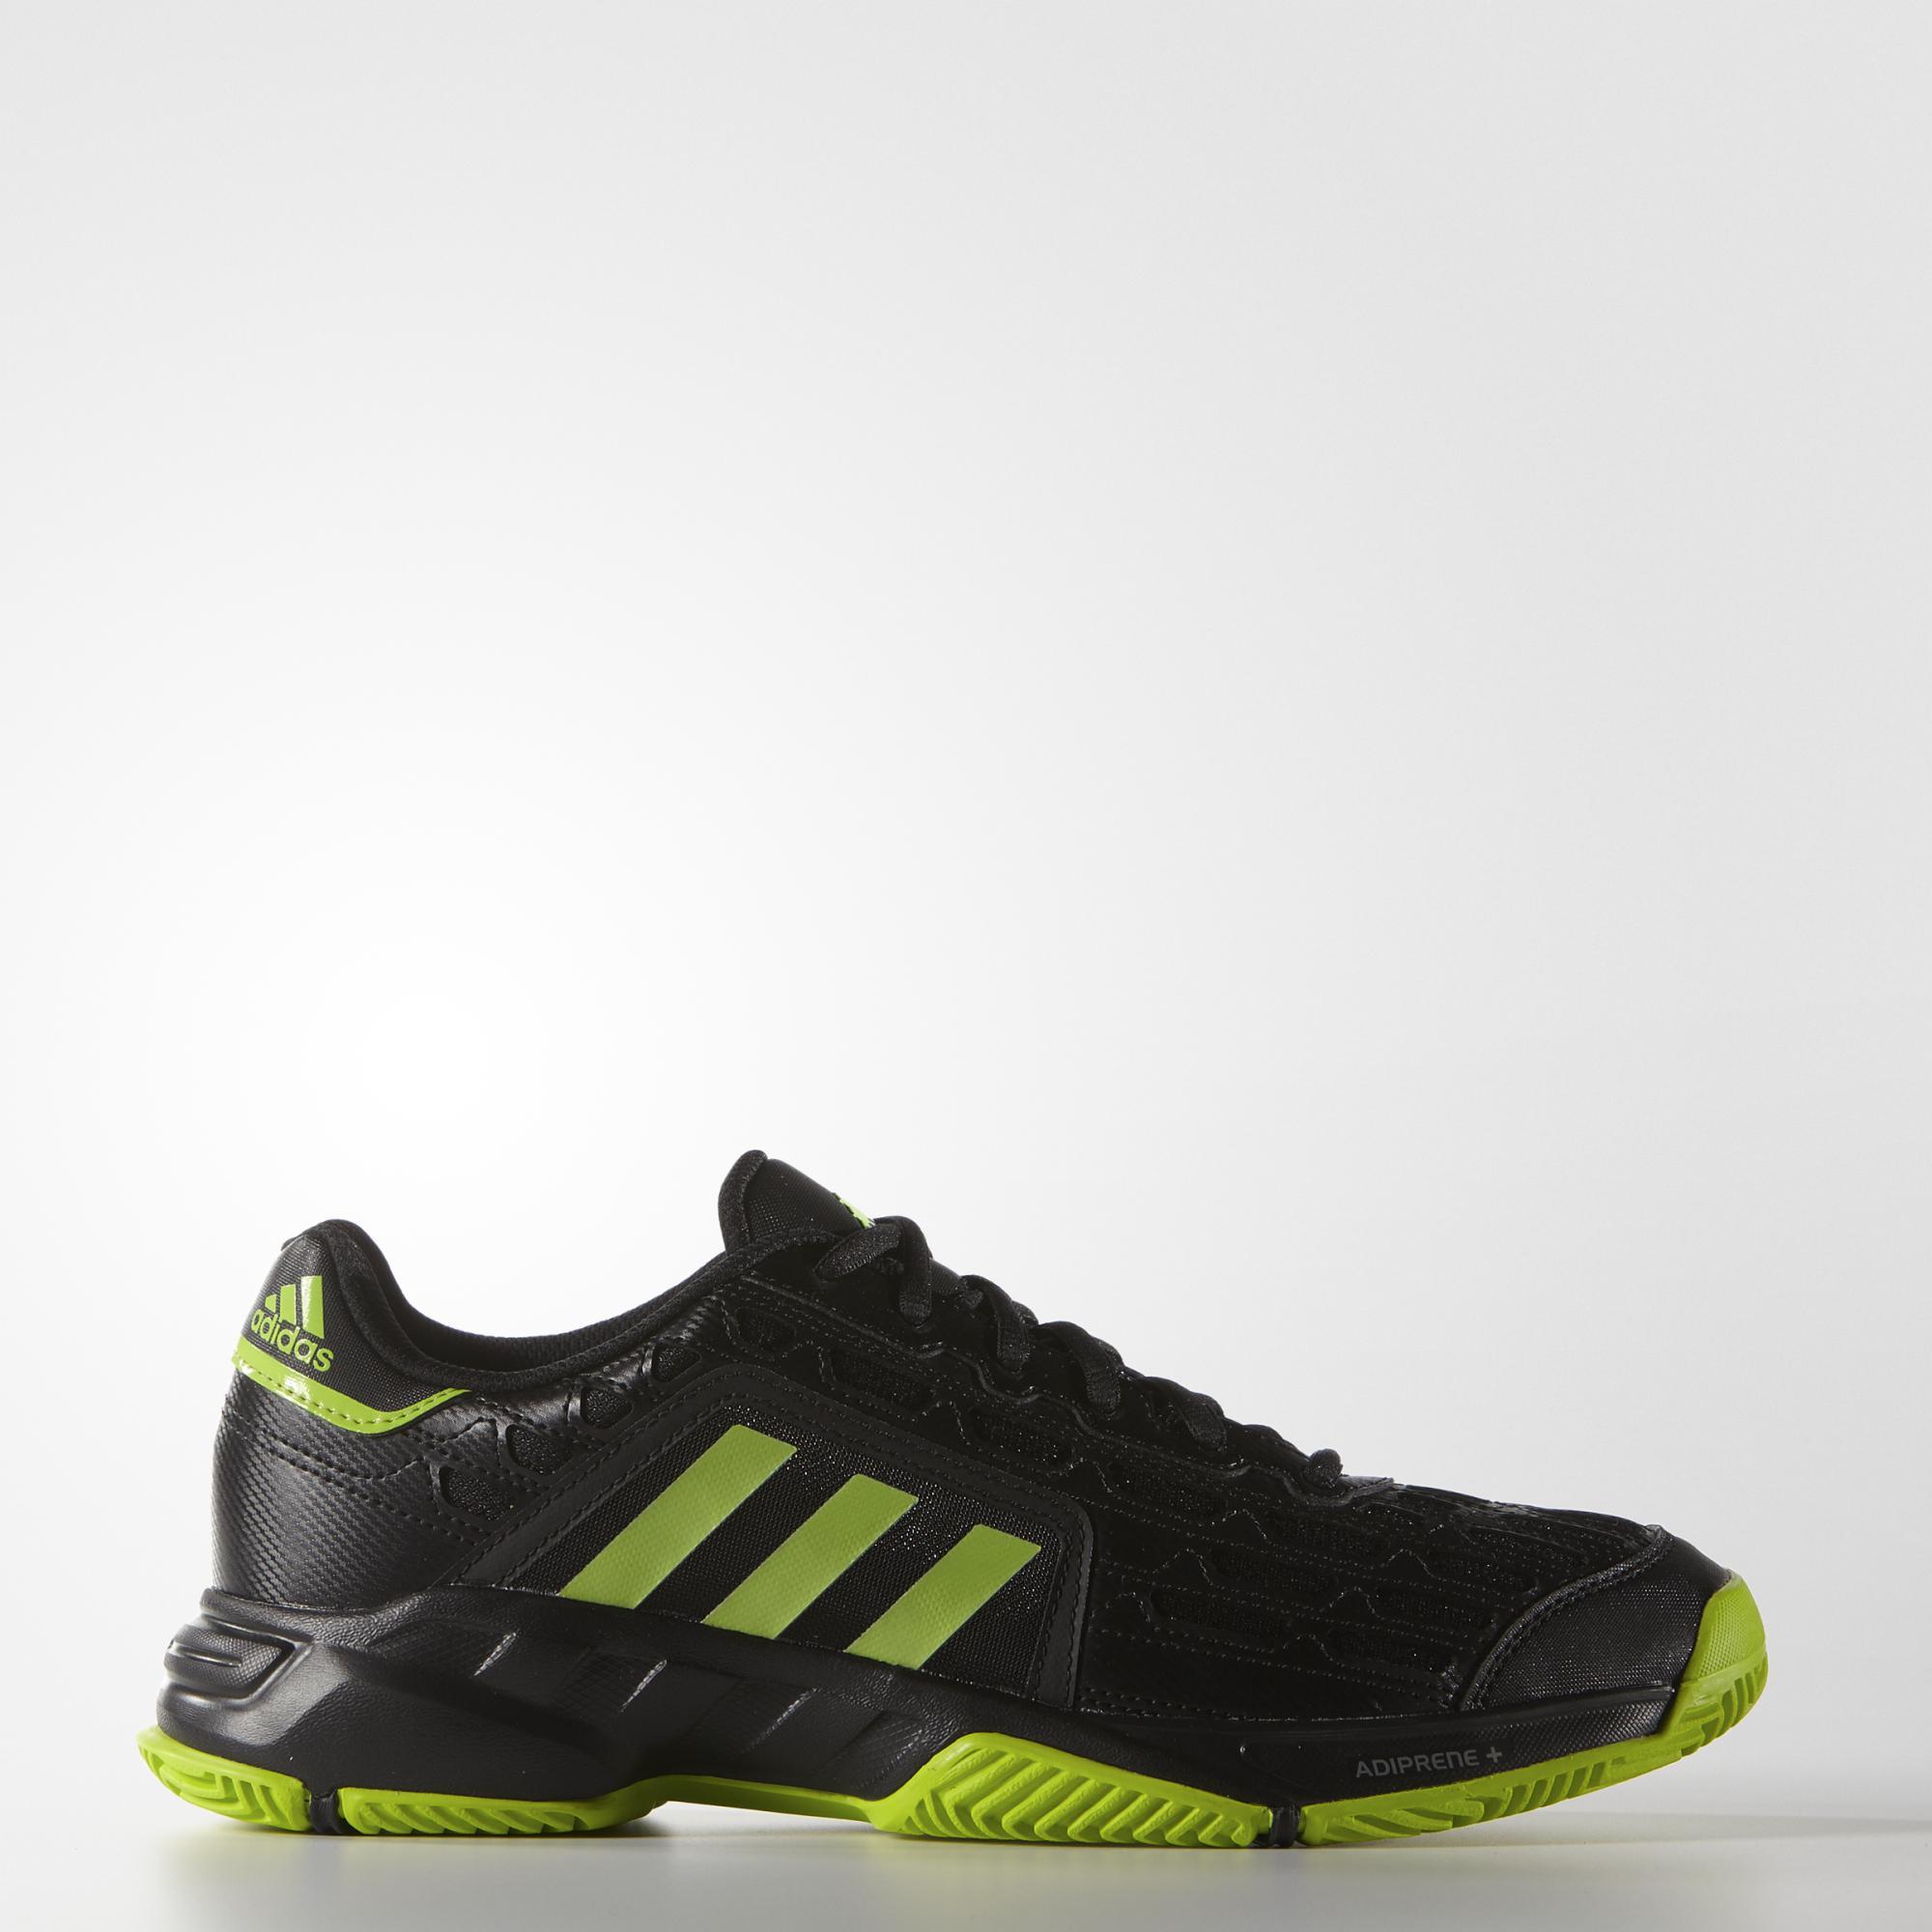 Adidas hombre Barricade tenis zapatos negro / verde